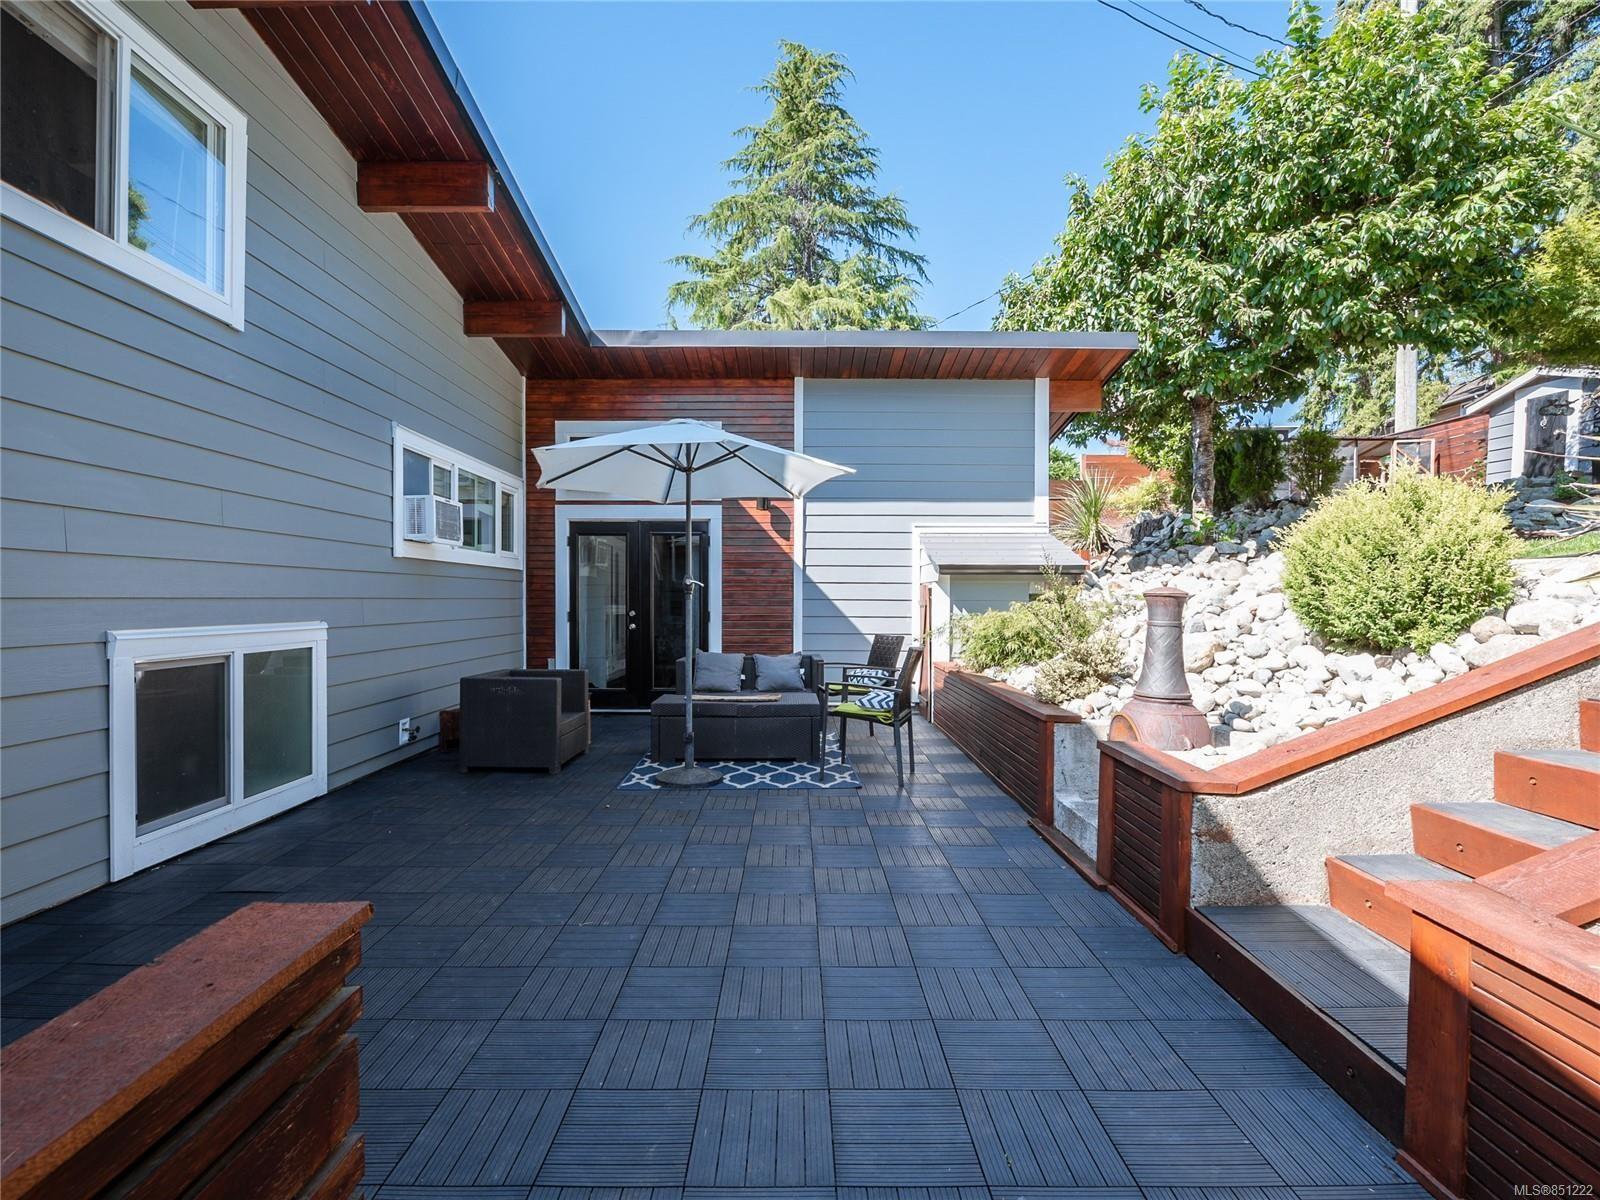 Photo 34: Photos: 2525 11th Ave in : PA Port Alberni House for sale (Port Alberni)  : MLS®# 851222